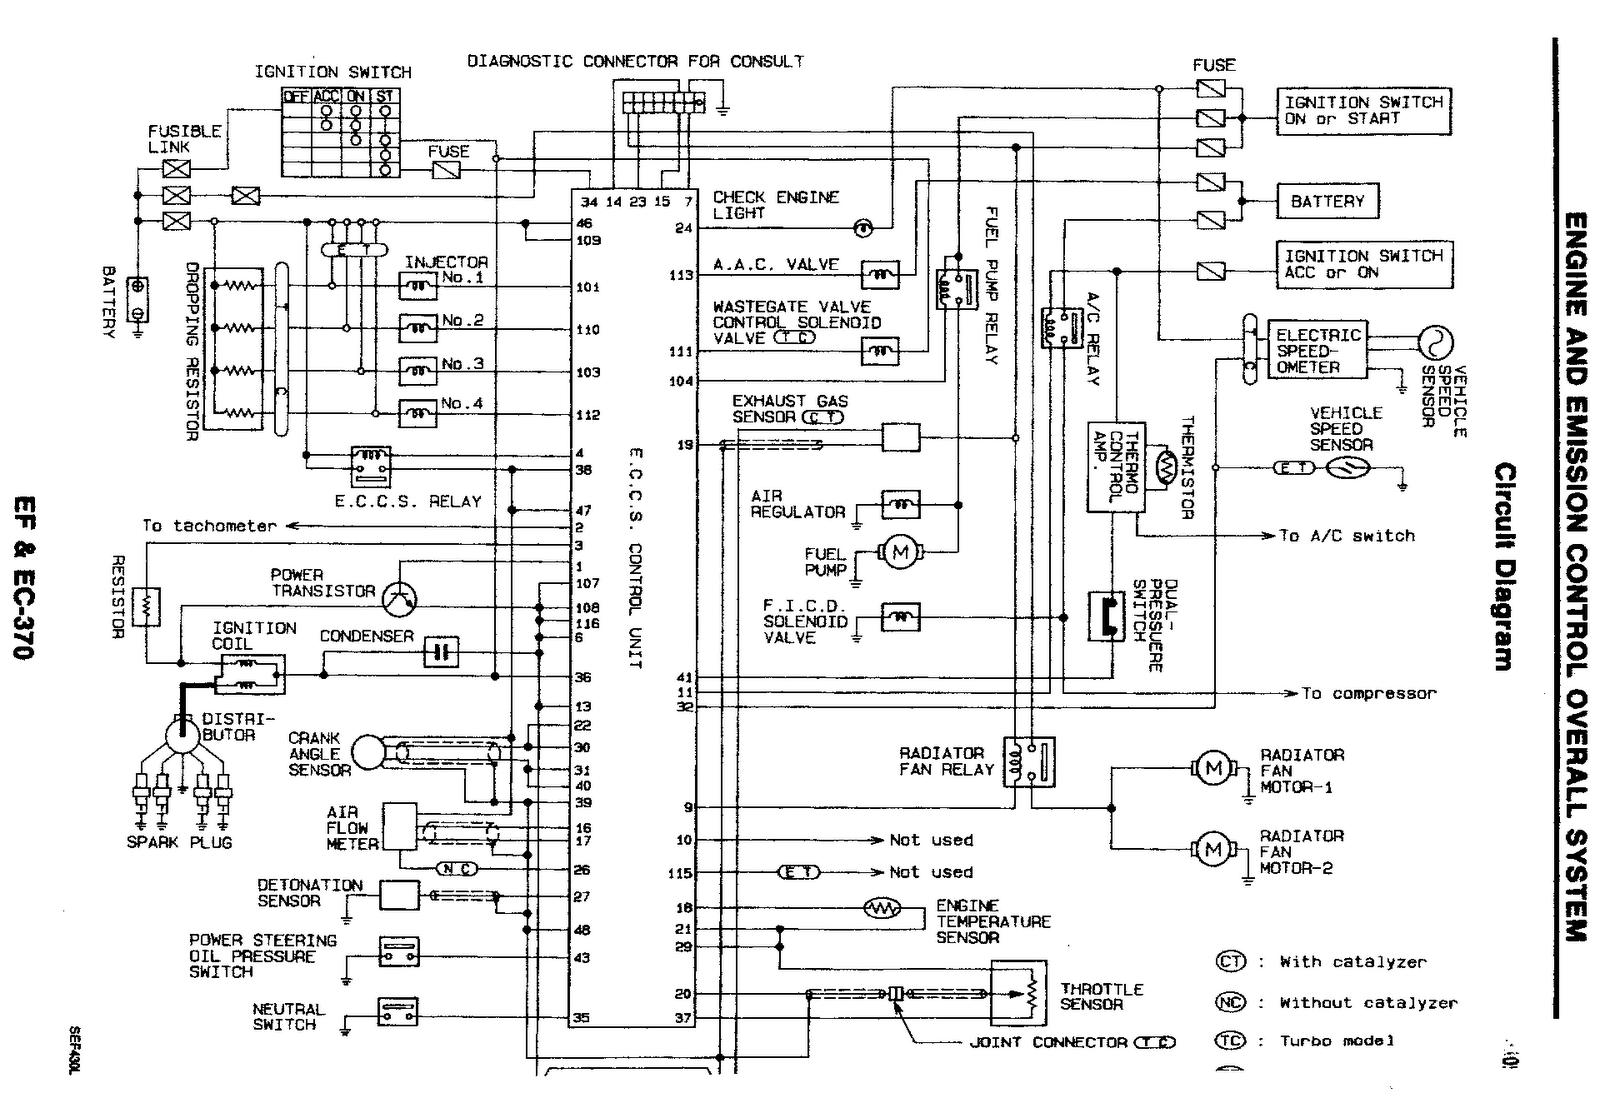 1998 Mitsubishi Eclipse Wiring Diagram - Fusebox and Wiring Diagram  component-penny - component-penny.parliamoneassieme.it | 1998 Mitsubishi Eclipse Wiring |  | diagram database